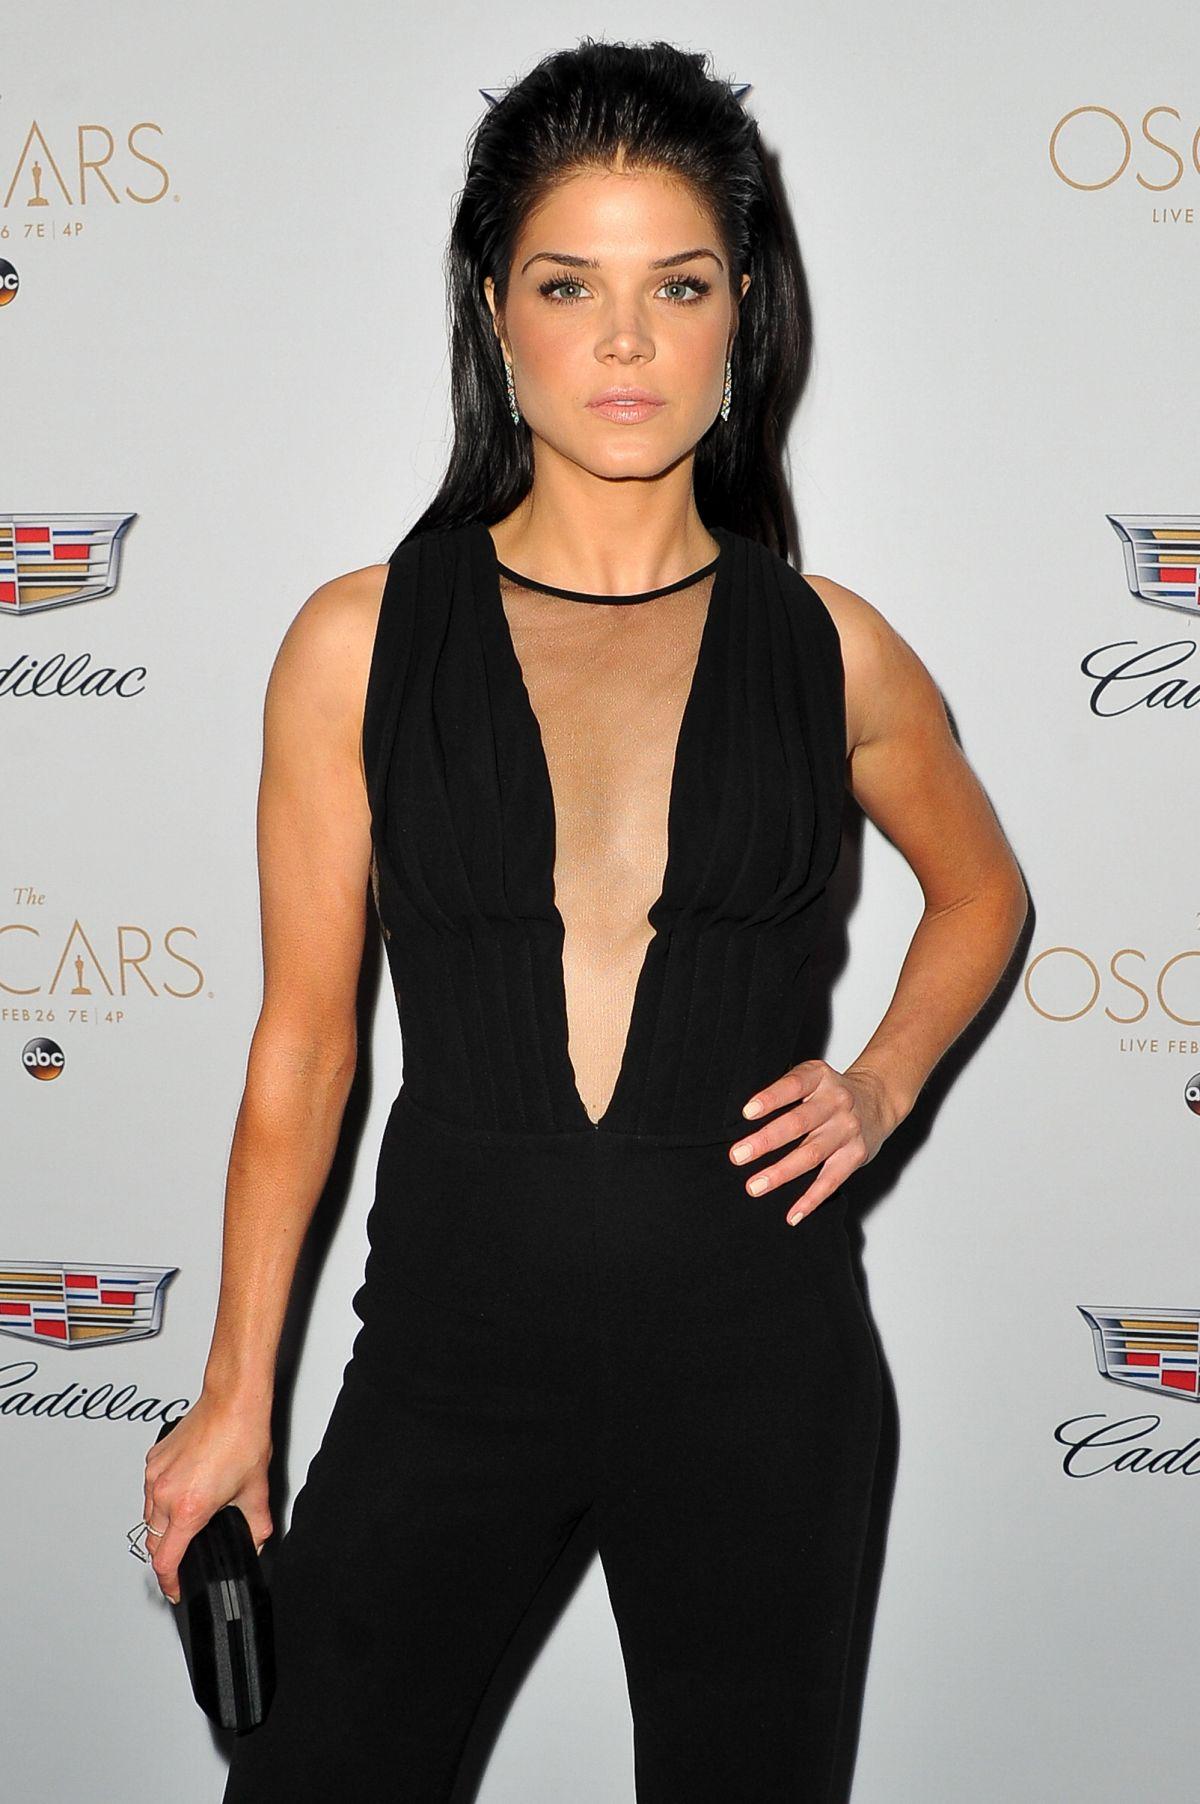 MARIE AVGEROPOULOS at Cadillac